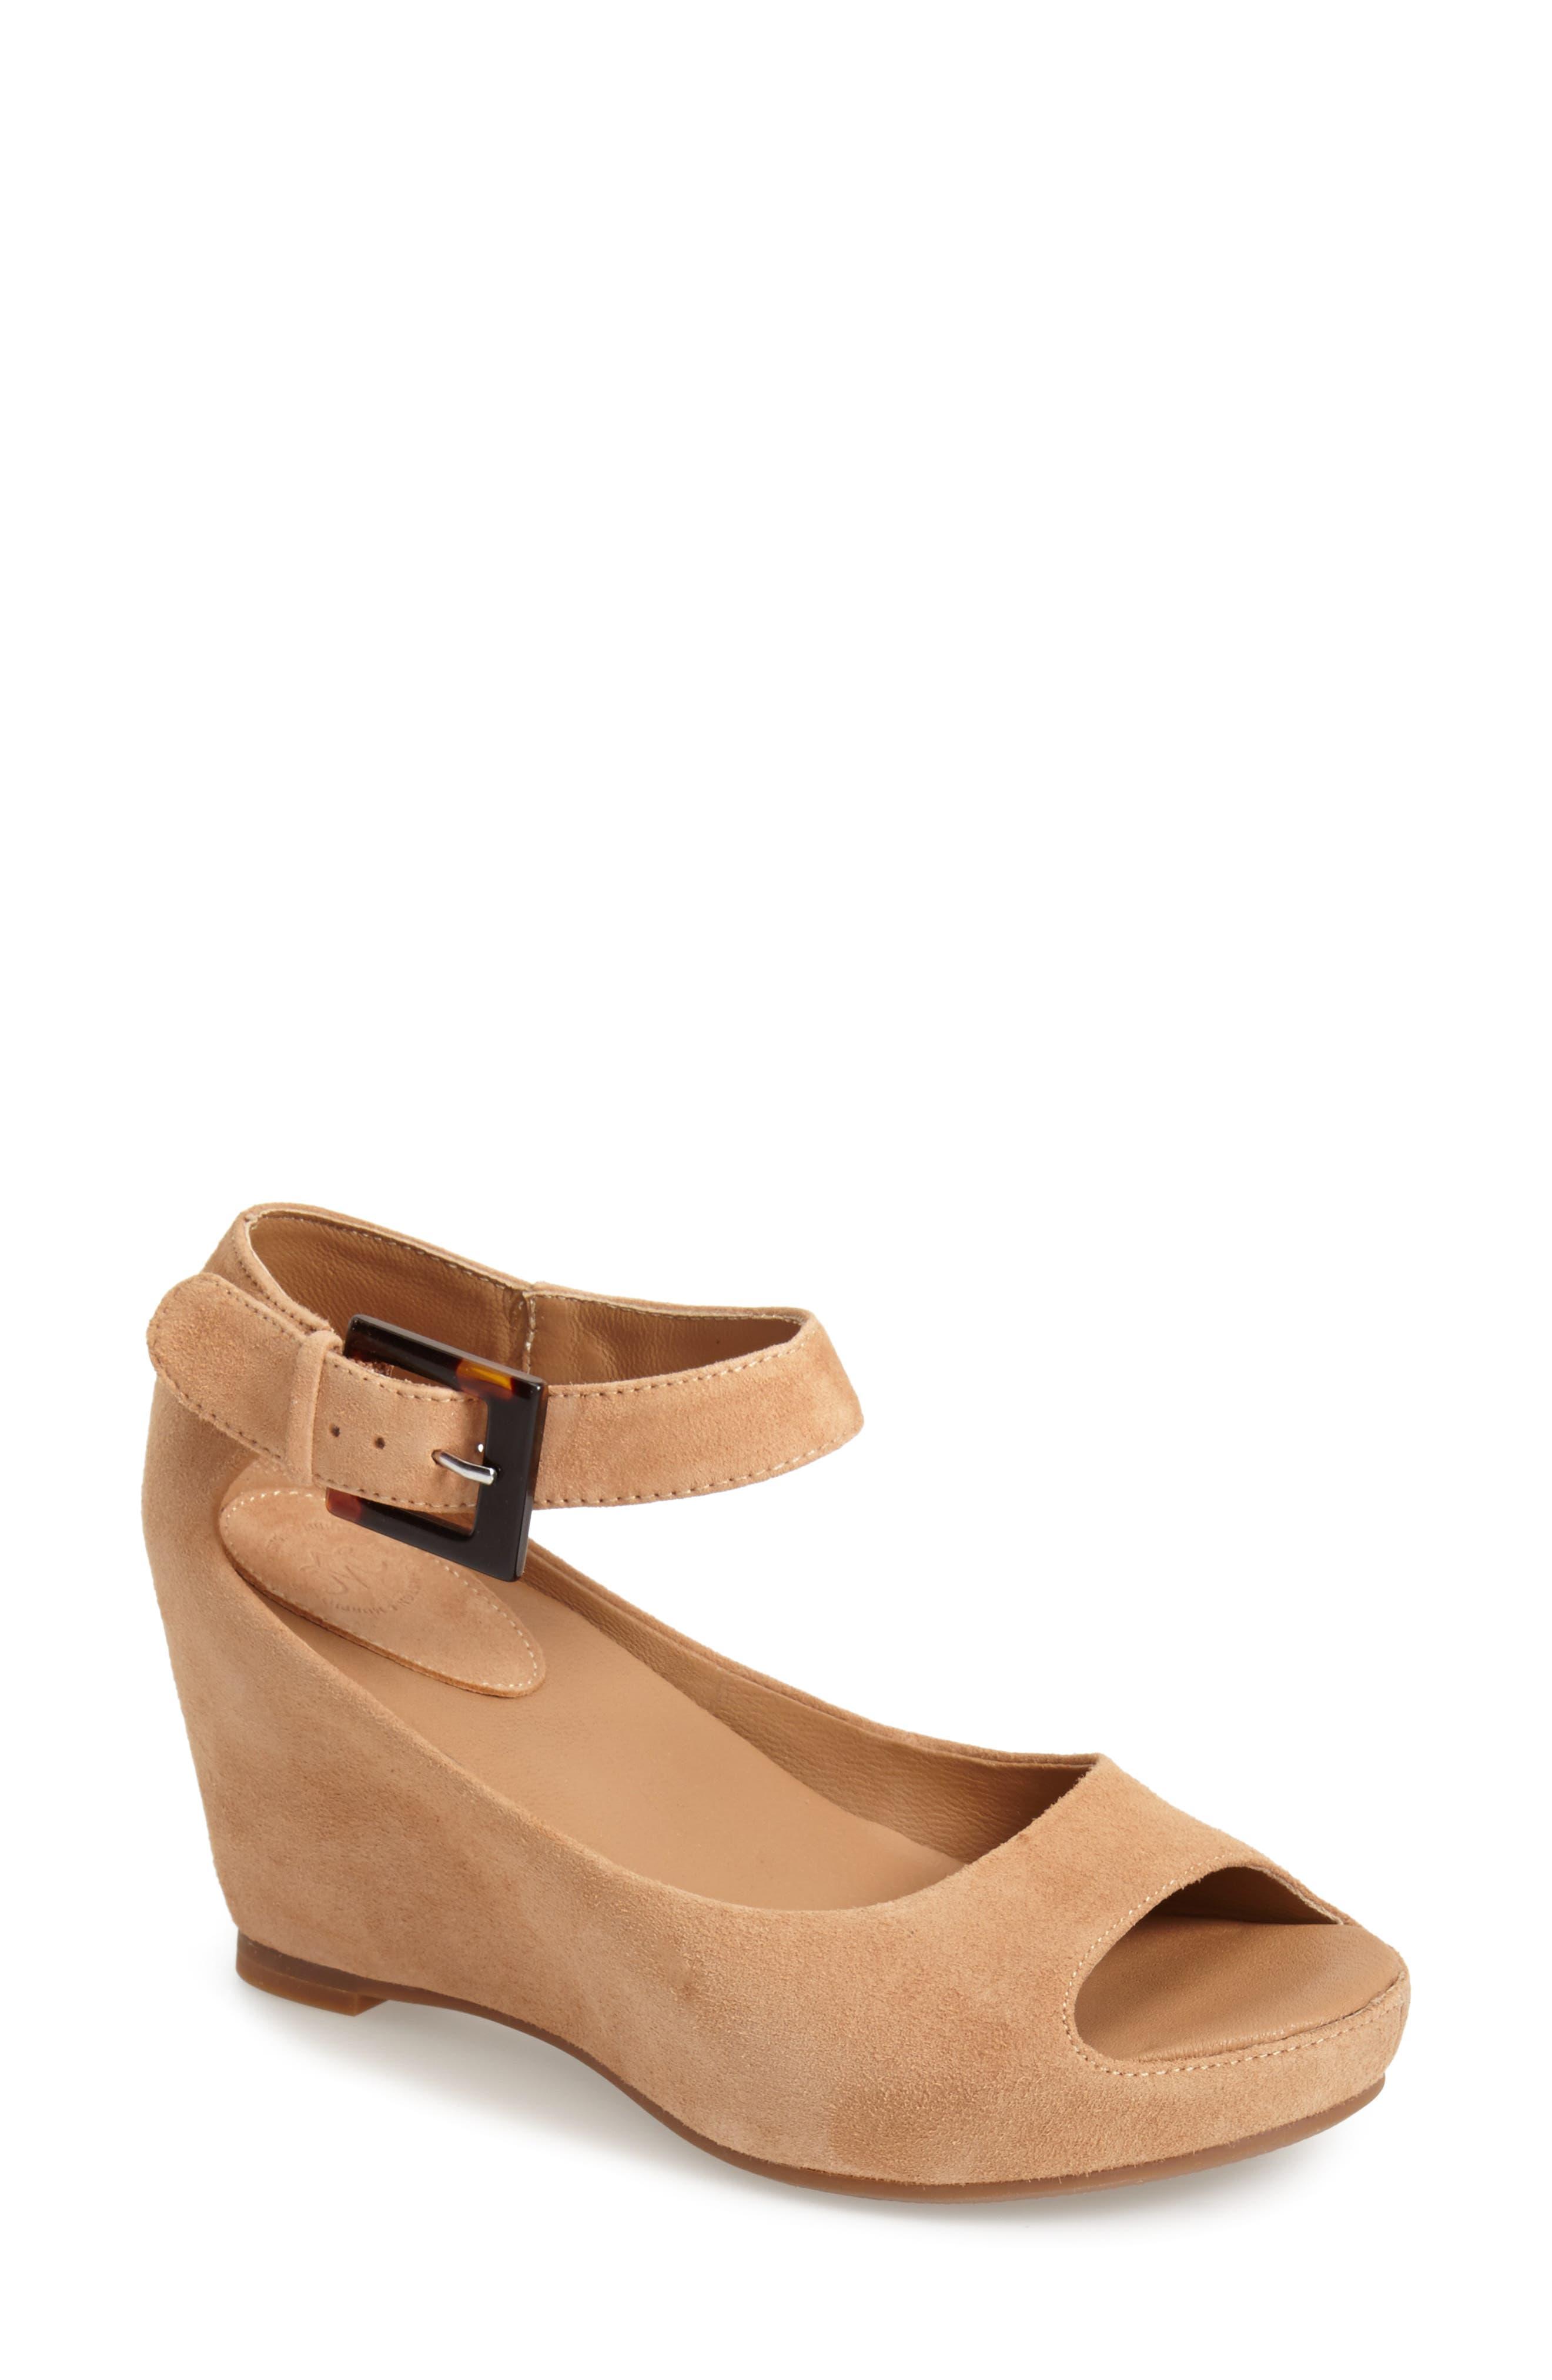 'Tricia' Ankle Strap Sandal,                             Alternate thumbnail 25, color,